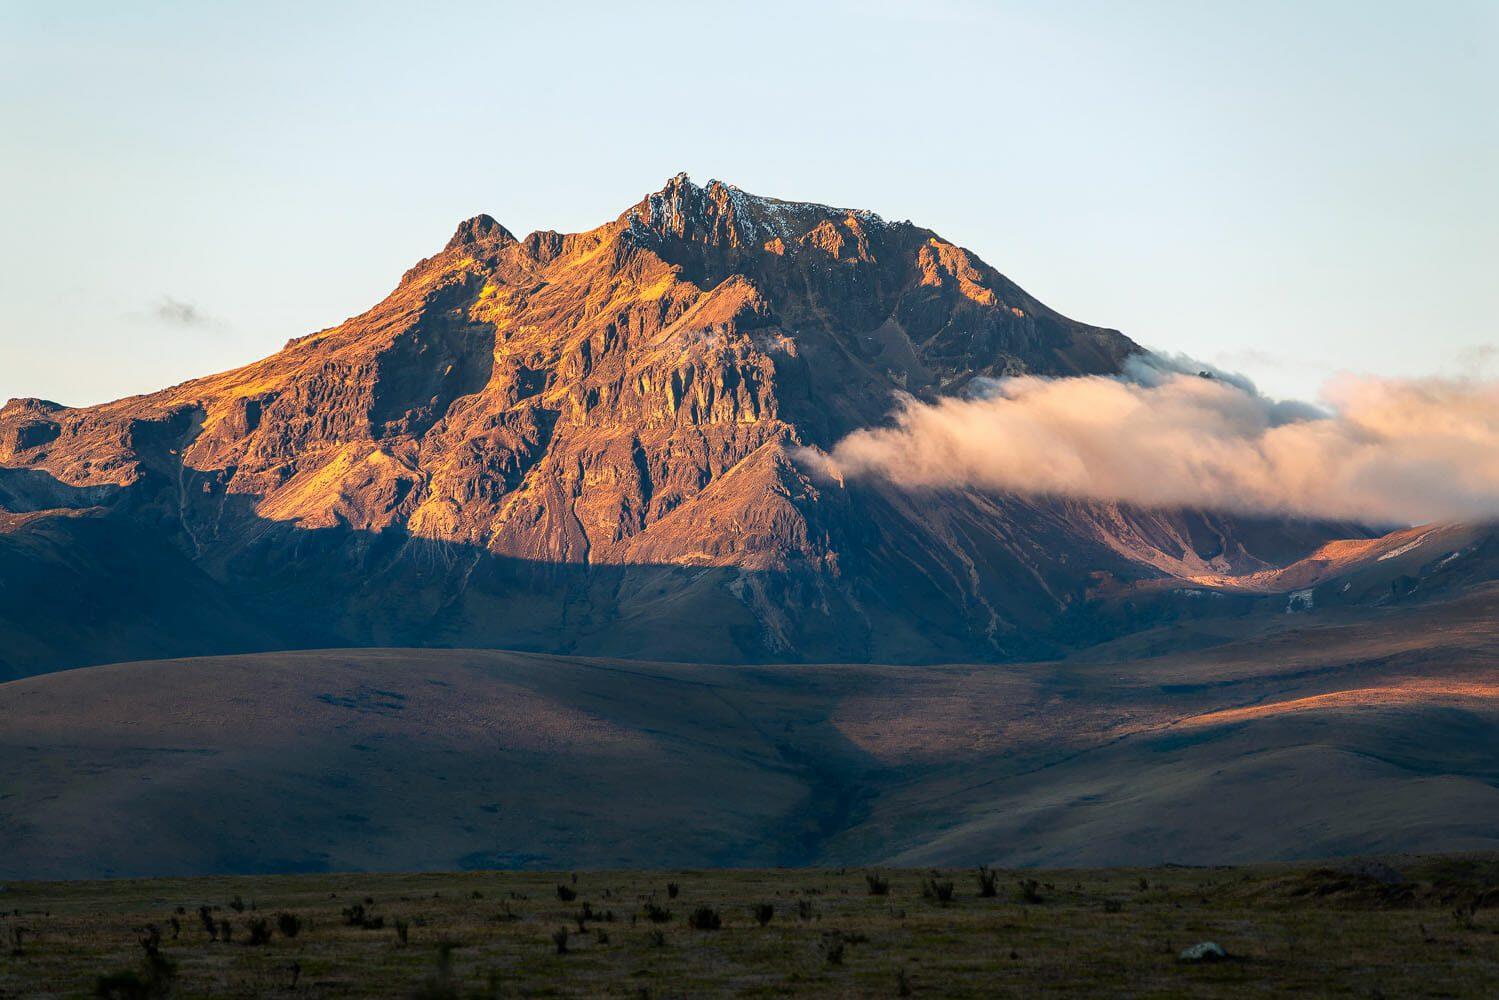 Sincholagua volcano at sunset